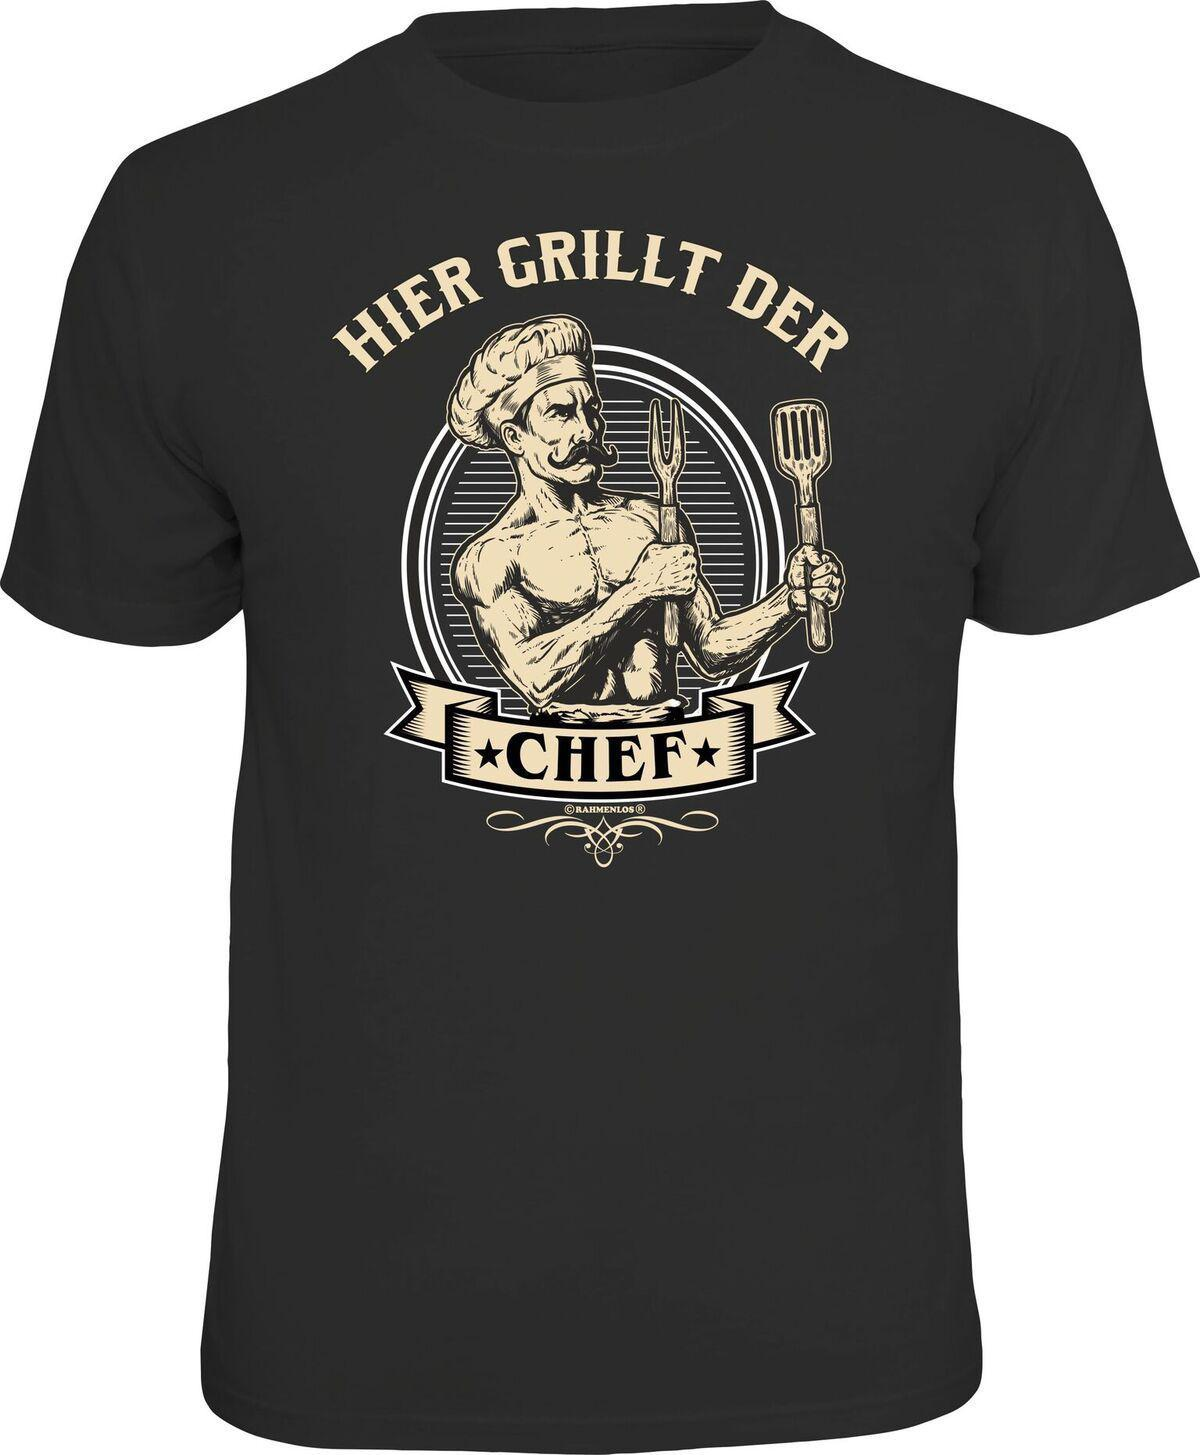 Grill T Shirt Hier Grillt Der Chef Shirt Bedruckt Geburtstag